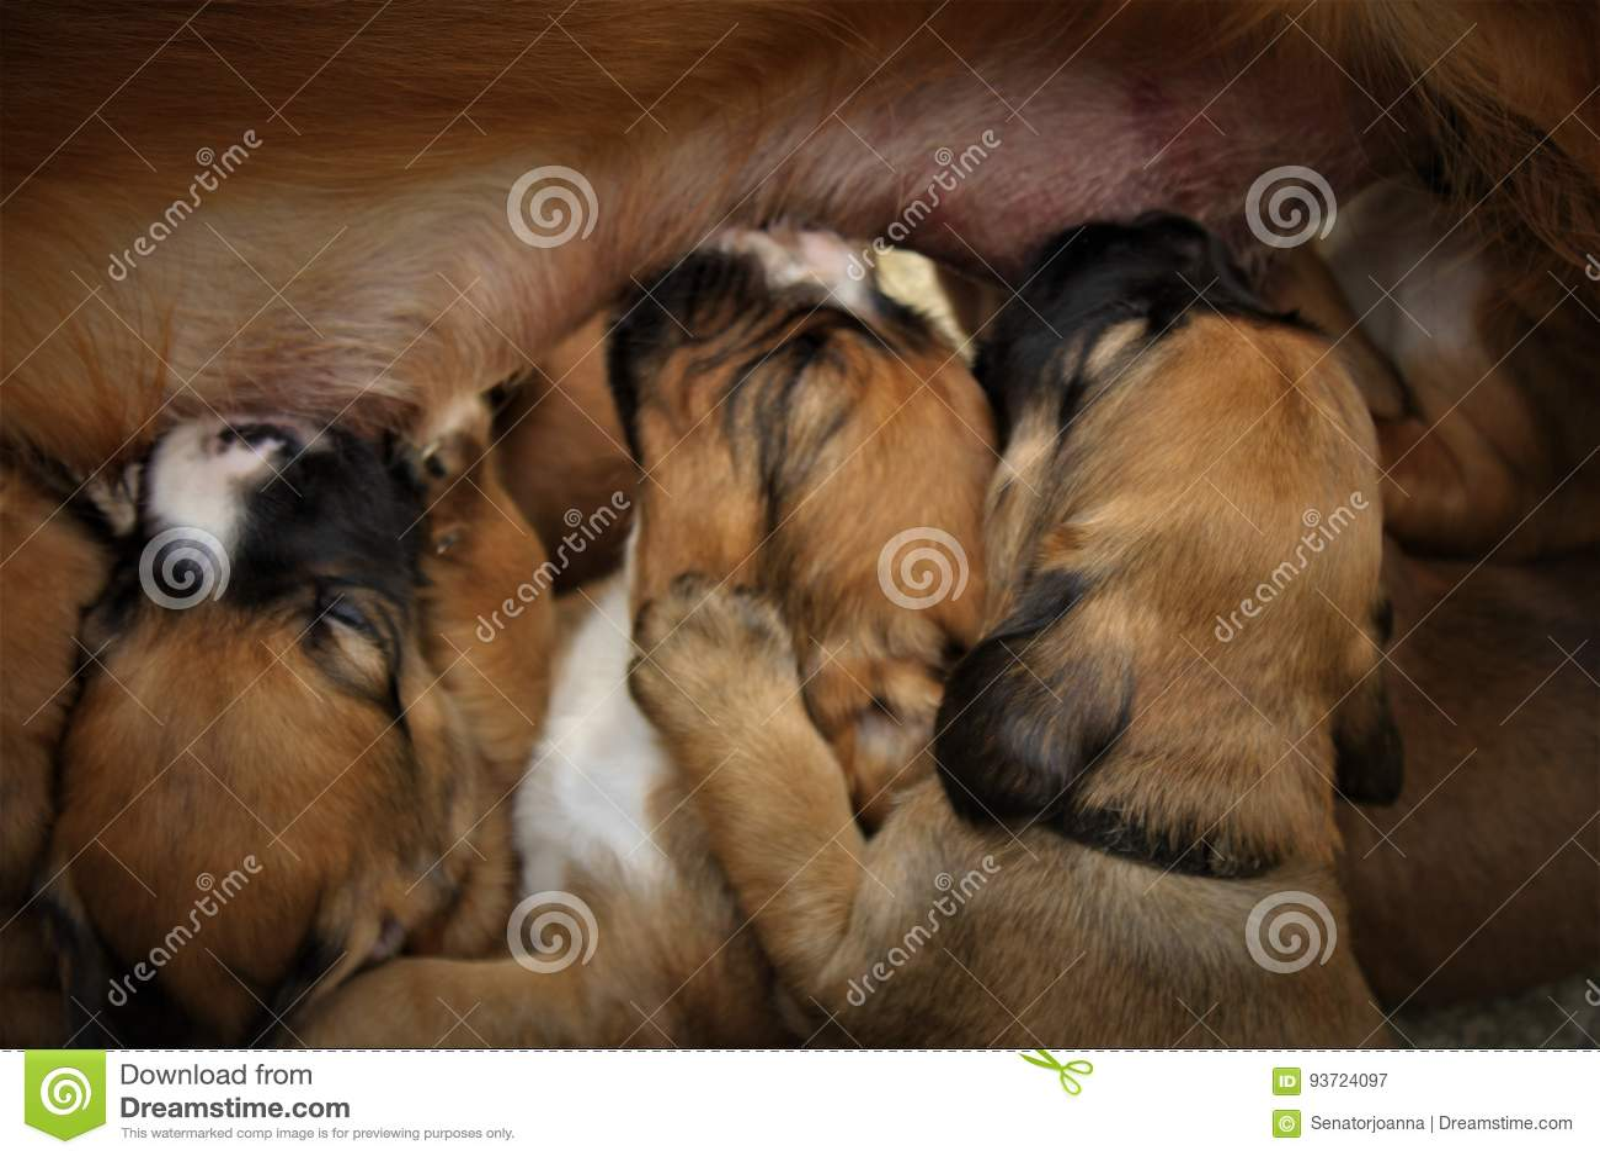 Little Puppies Nursing Stock Image Image Of Cocker Breast 93724097